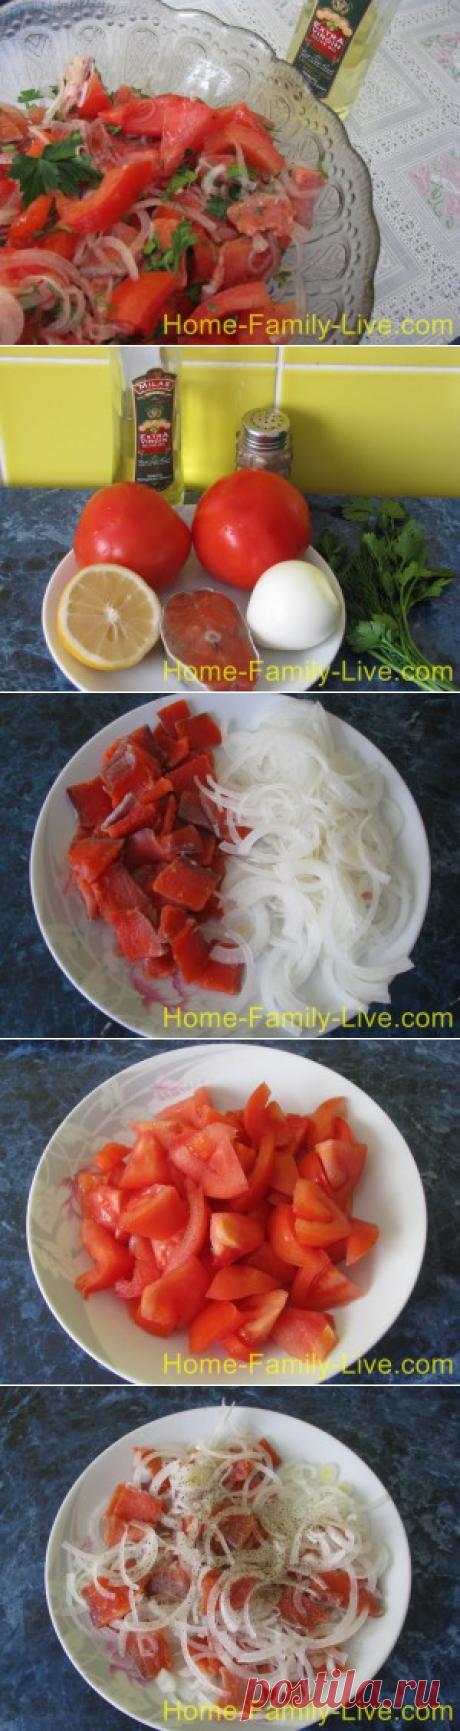 La ensalada Del Amur - poshagovyy la fotoreceta - magro salatkulinarnye las recetas